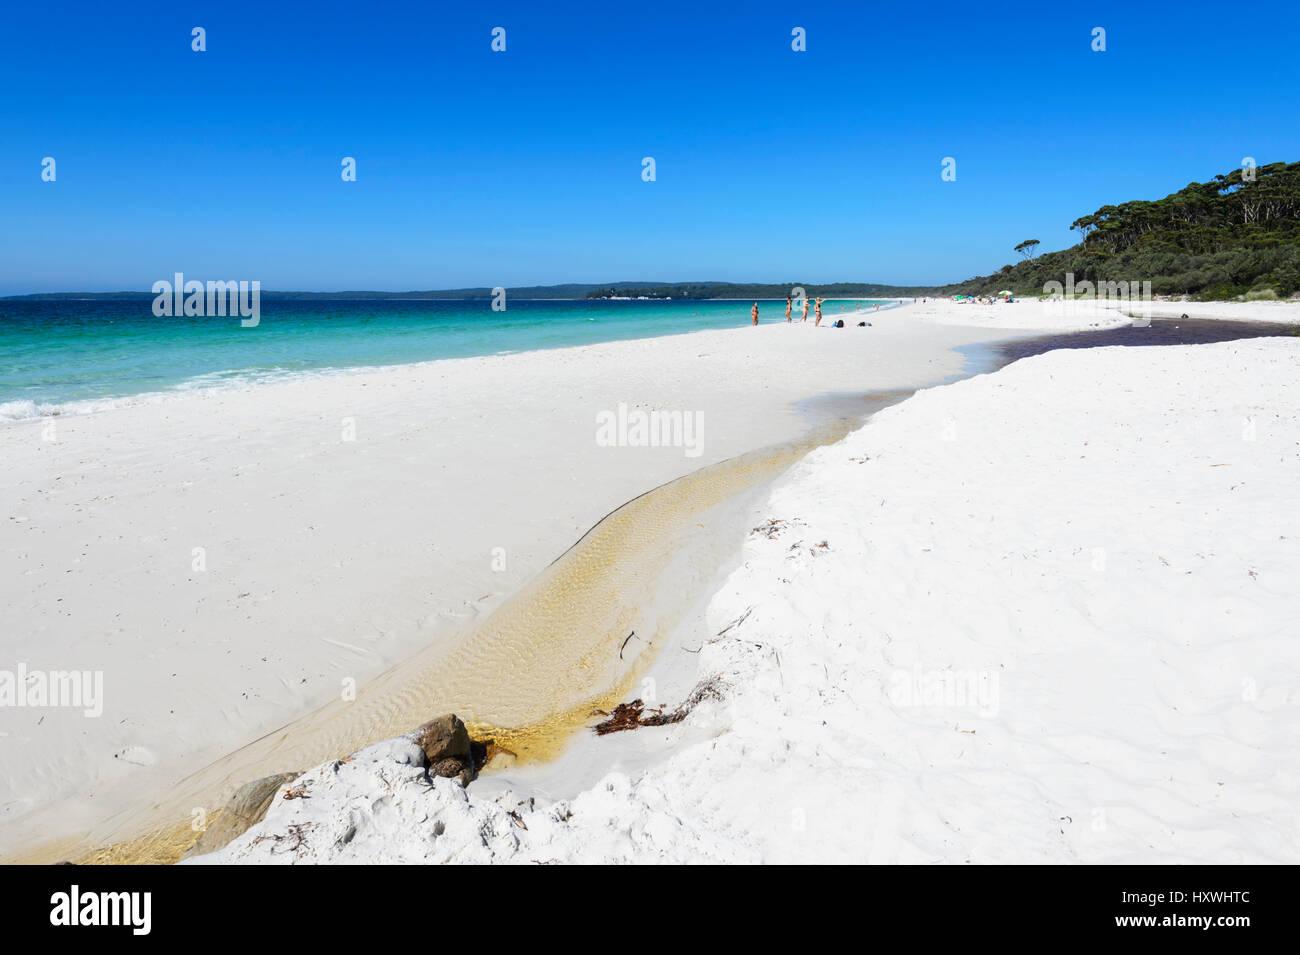 hyams-beach-is-a-spectacular-stretch-of-